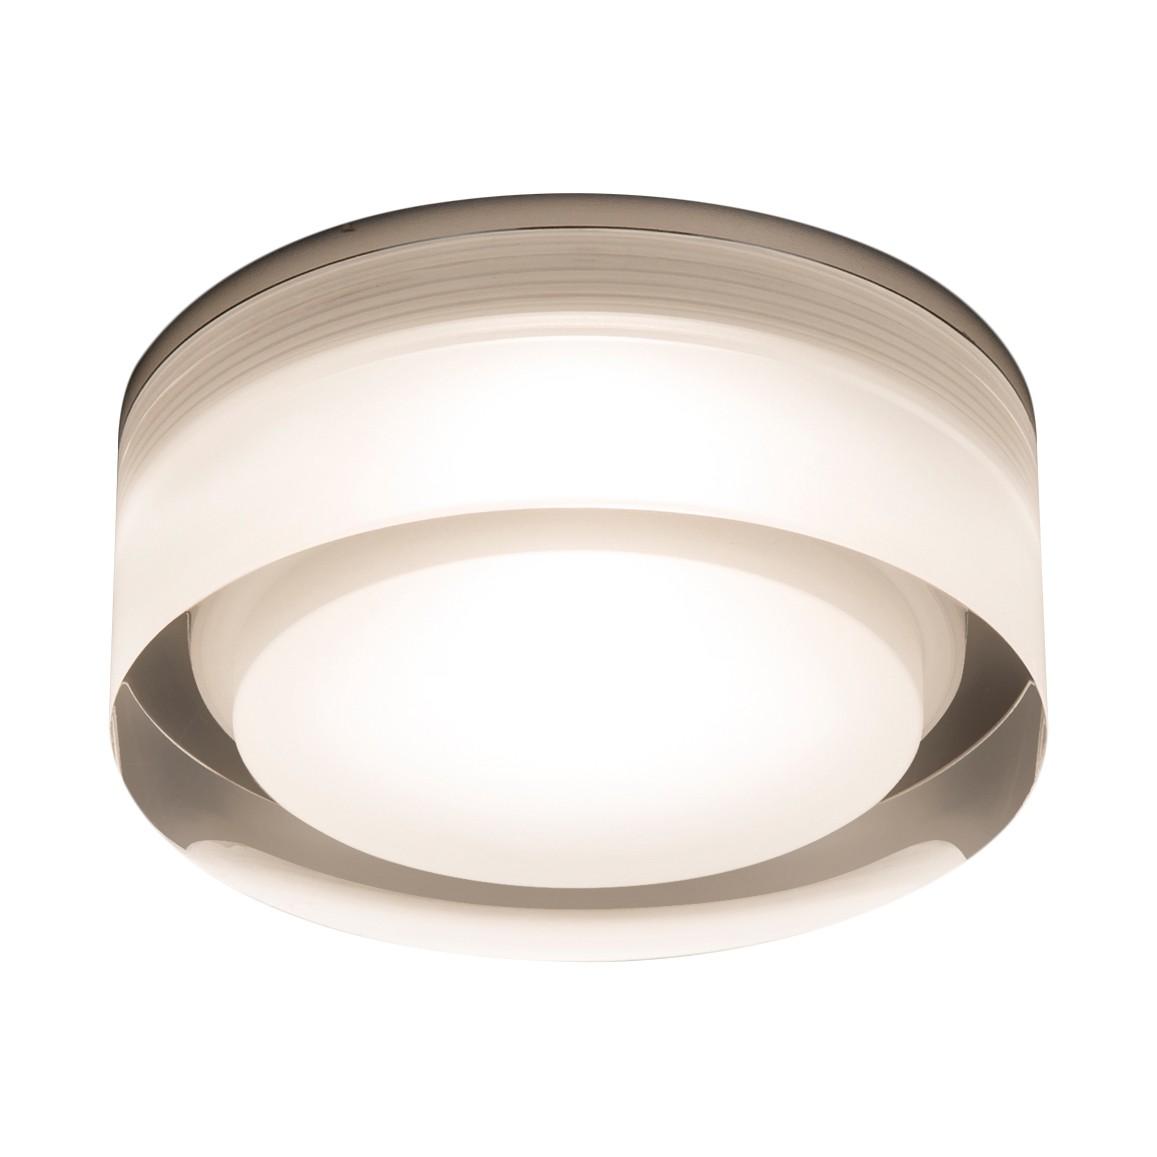 Deckenleuchte Vancouver 1-flammig ● Silber Metall- verchromt- Illumina A+